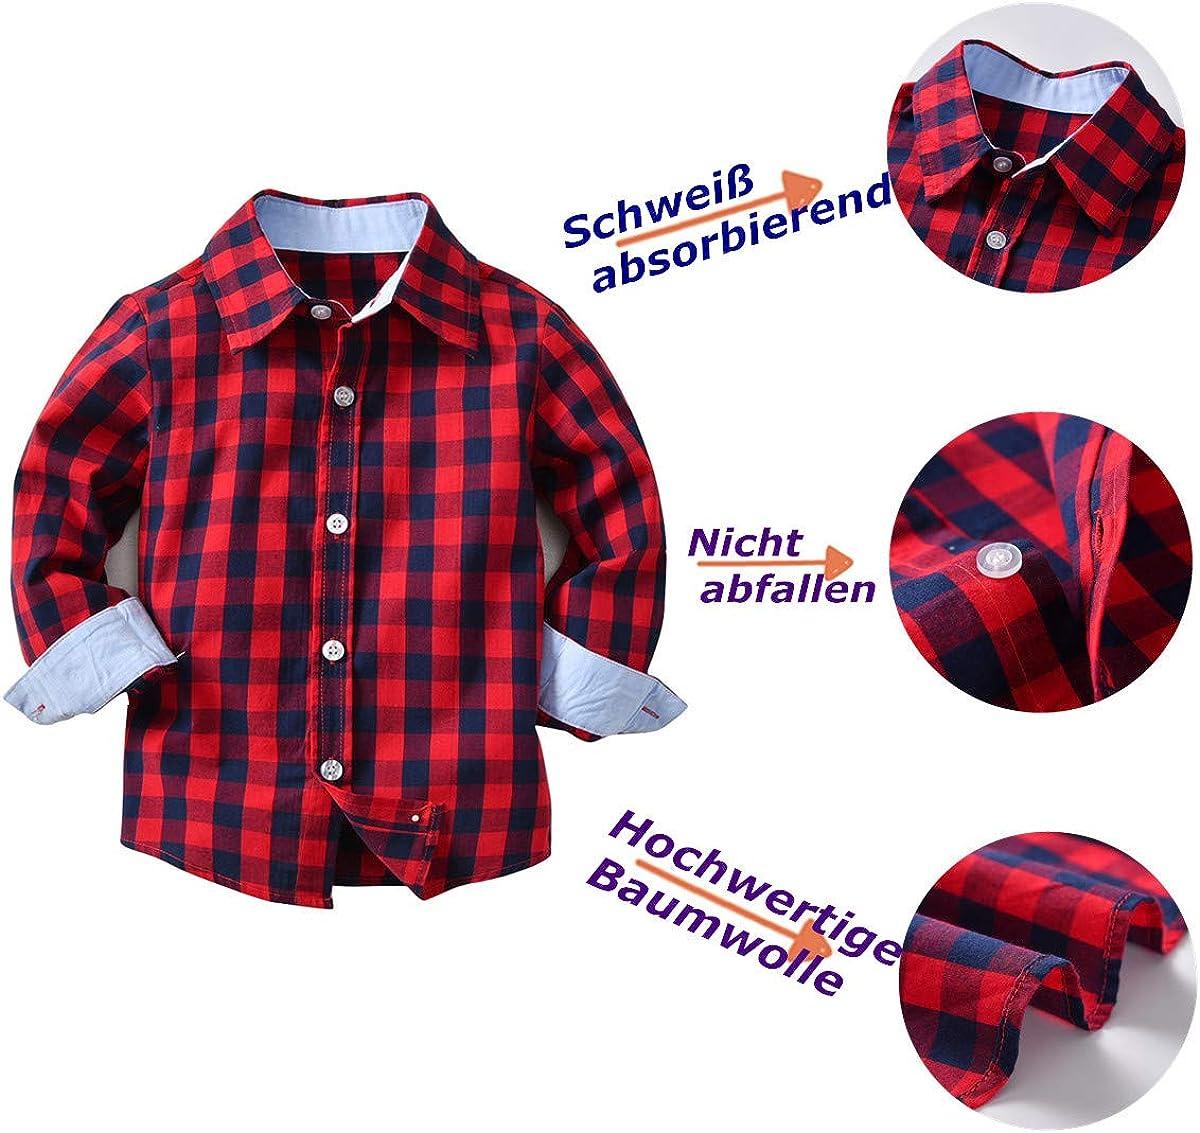 Fashionable Jeans Tuxedo Suit Gentleman Spring and Autumn Clothes SANMIO Baby Boys Clothing Sets Romper Cotton Shirt